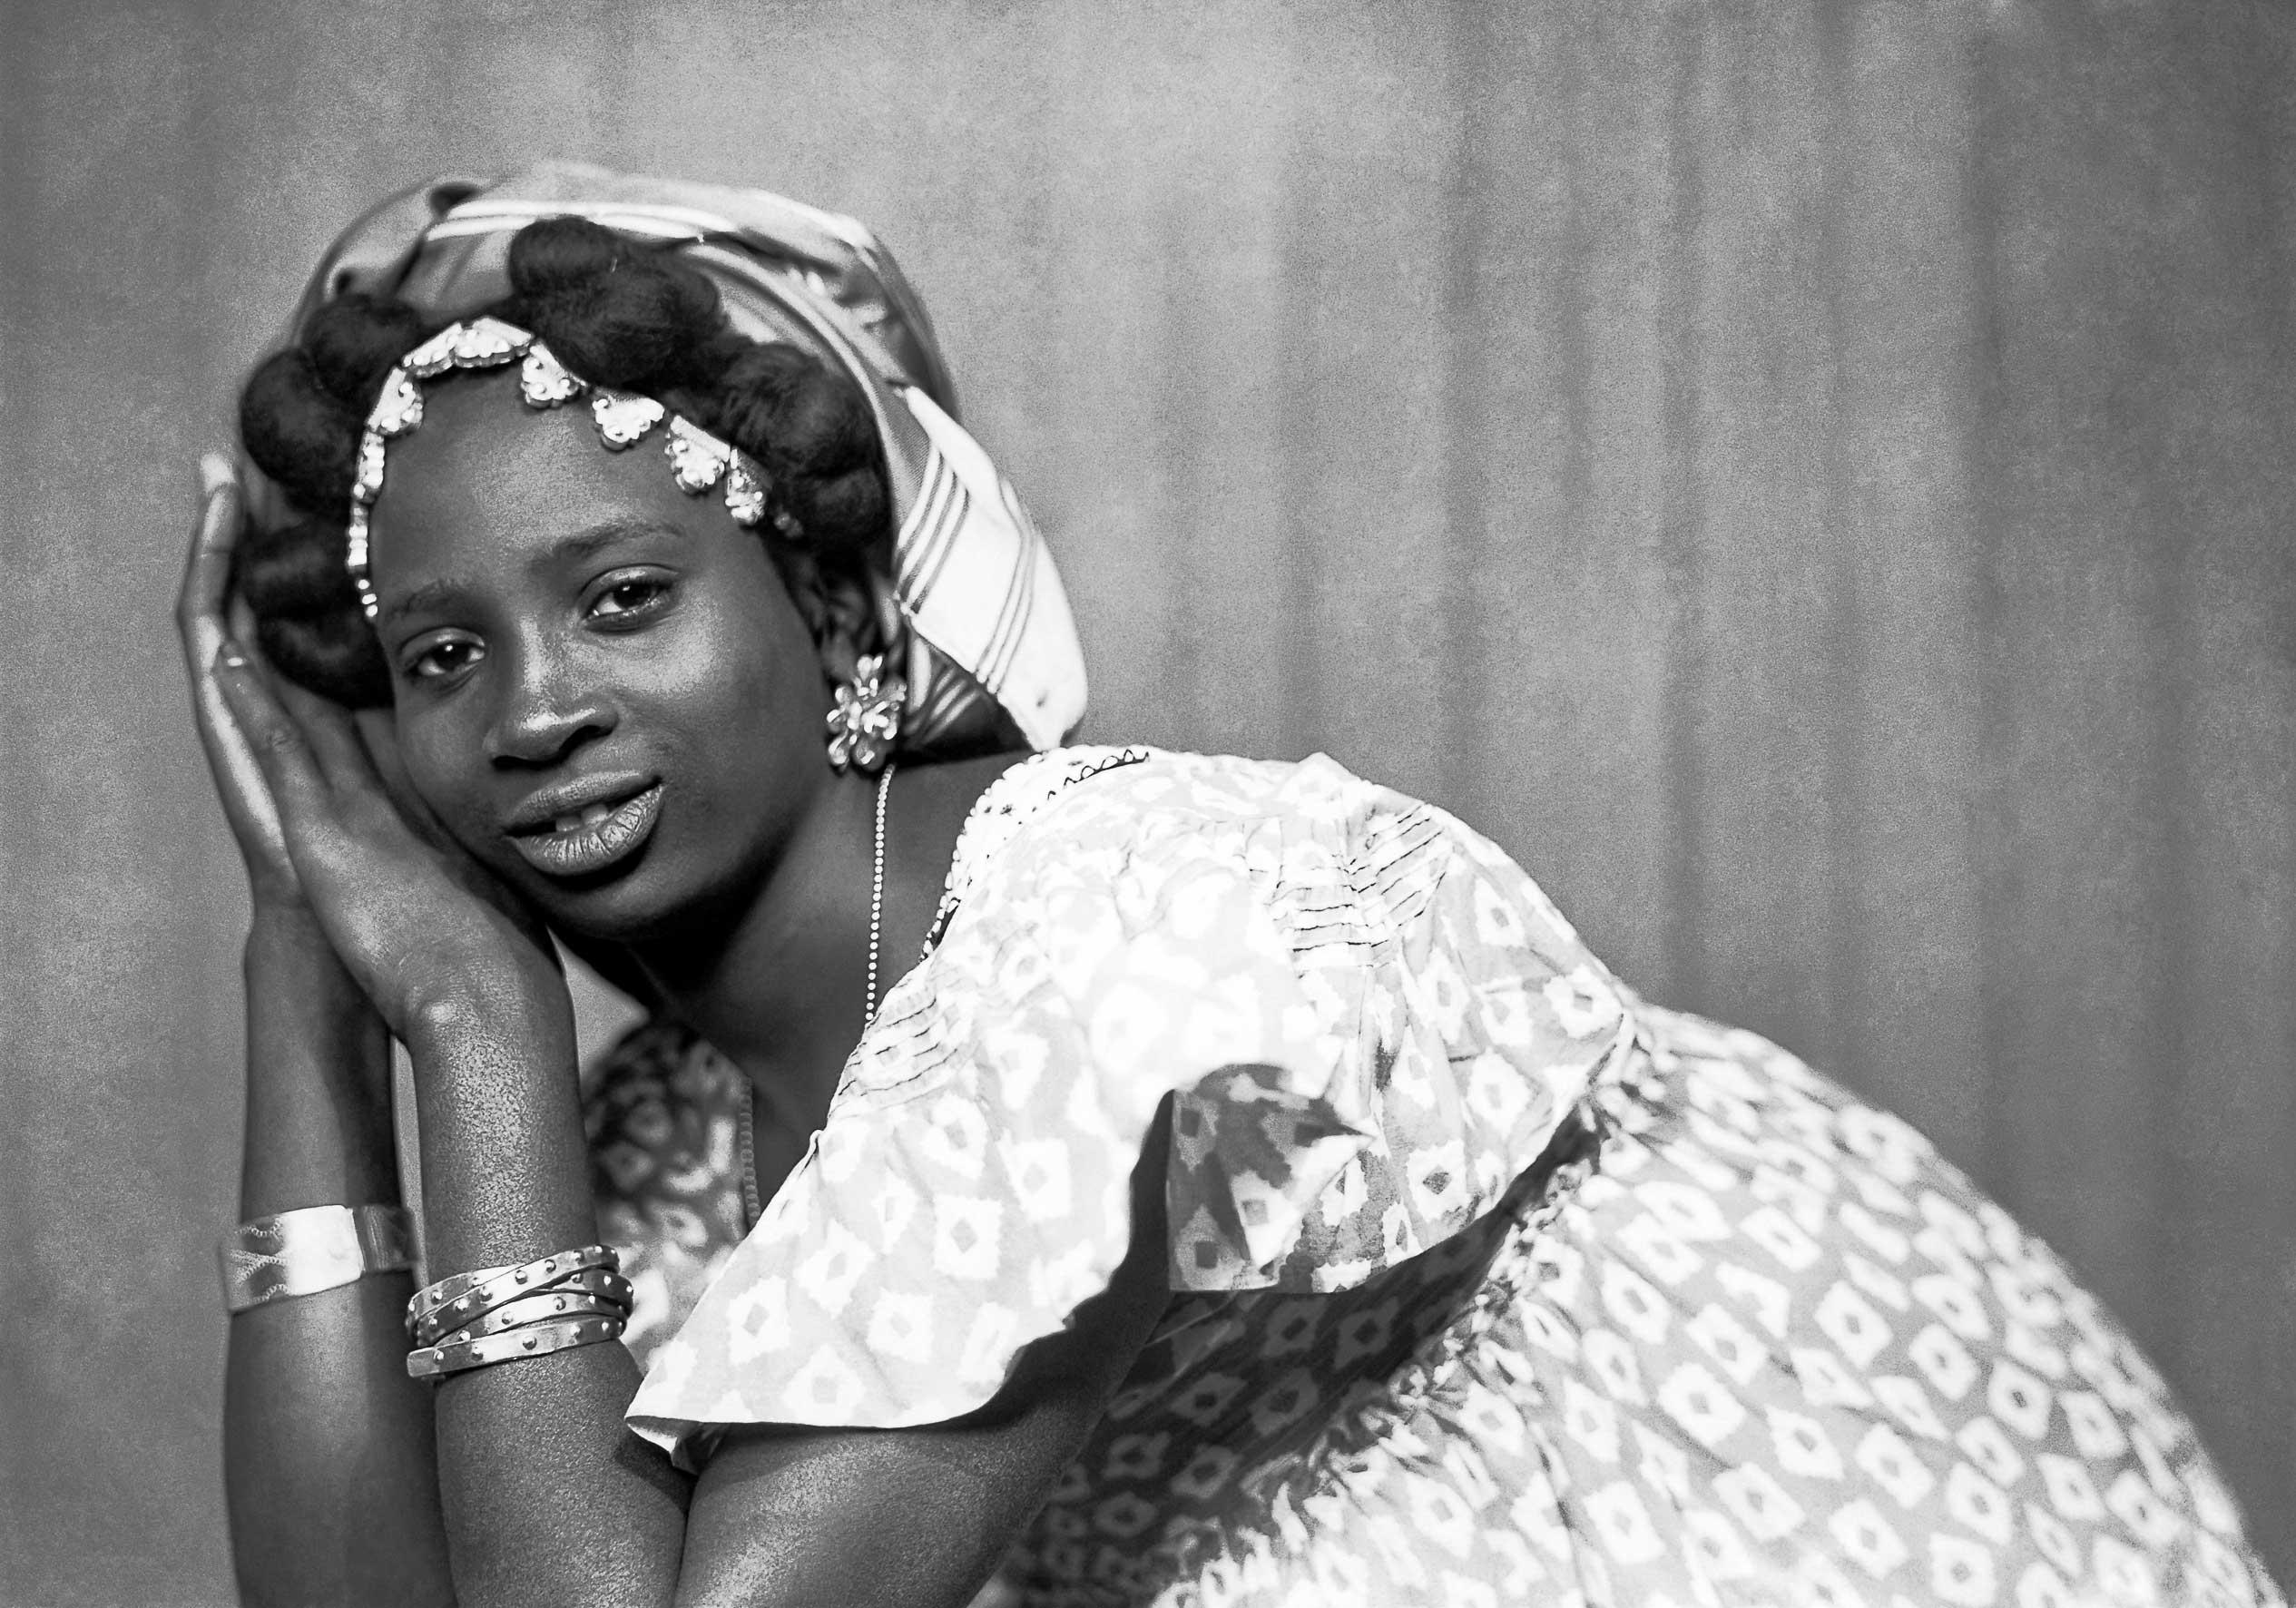 Mama Casset, St Louis 1908/Dakar 1992, © Photo Mama Casset, Studio African Photo, Dakar, Sénégal, 1950-60 Estate of Mama Casset / courtesy Revue Noire